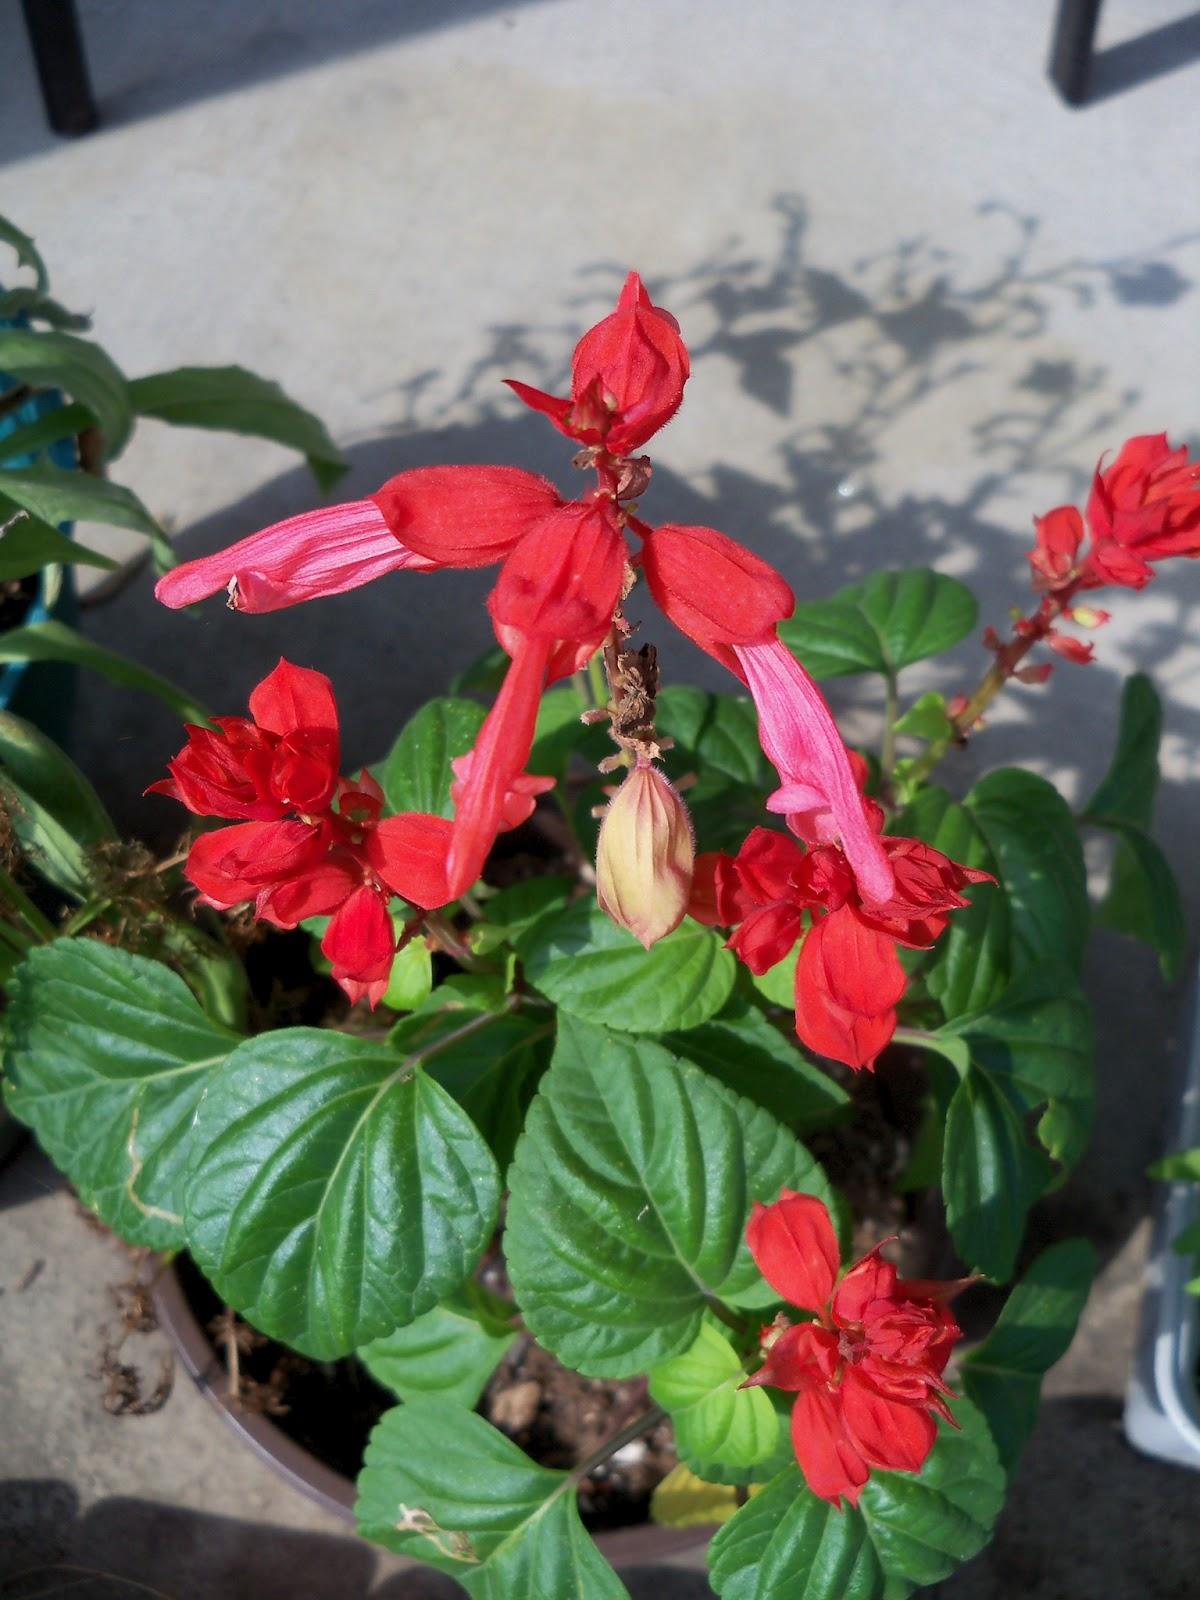 Gardening 2012 - 115_2875.JPG